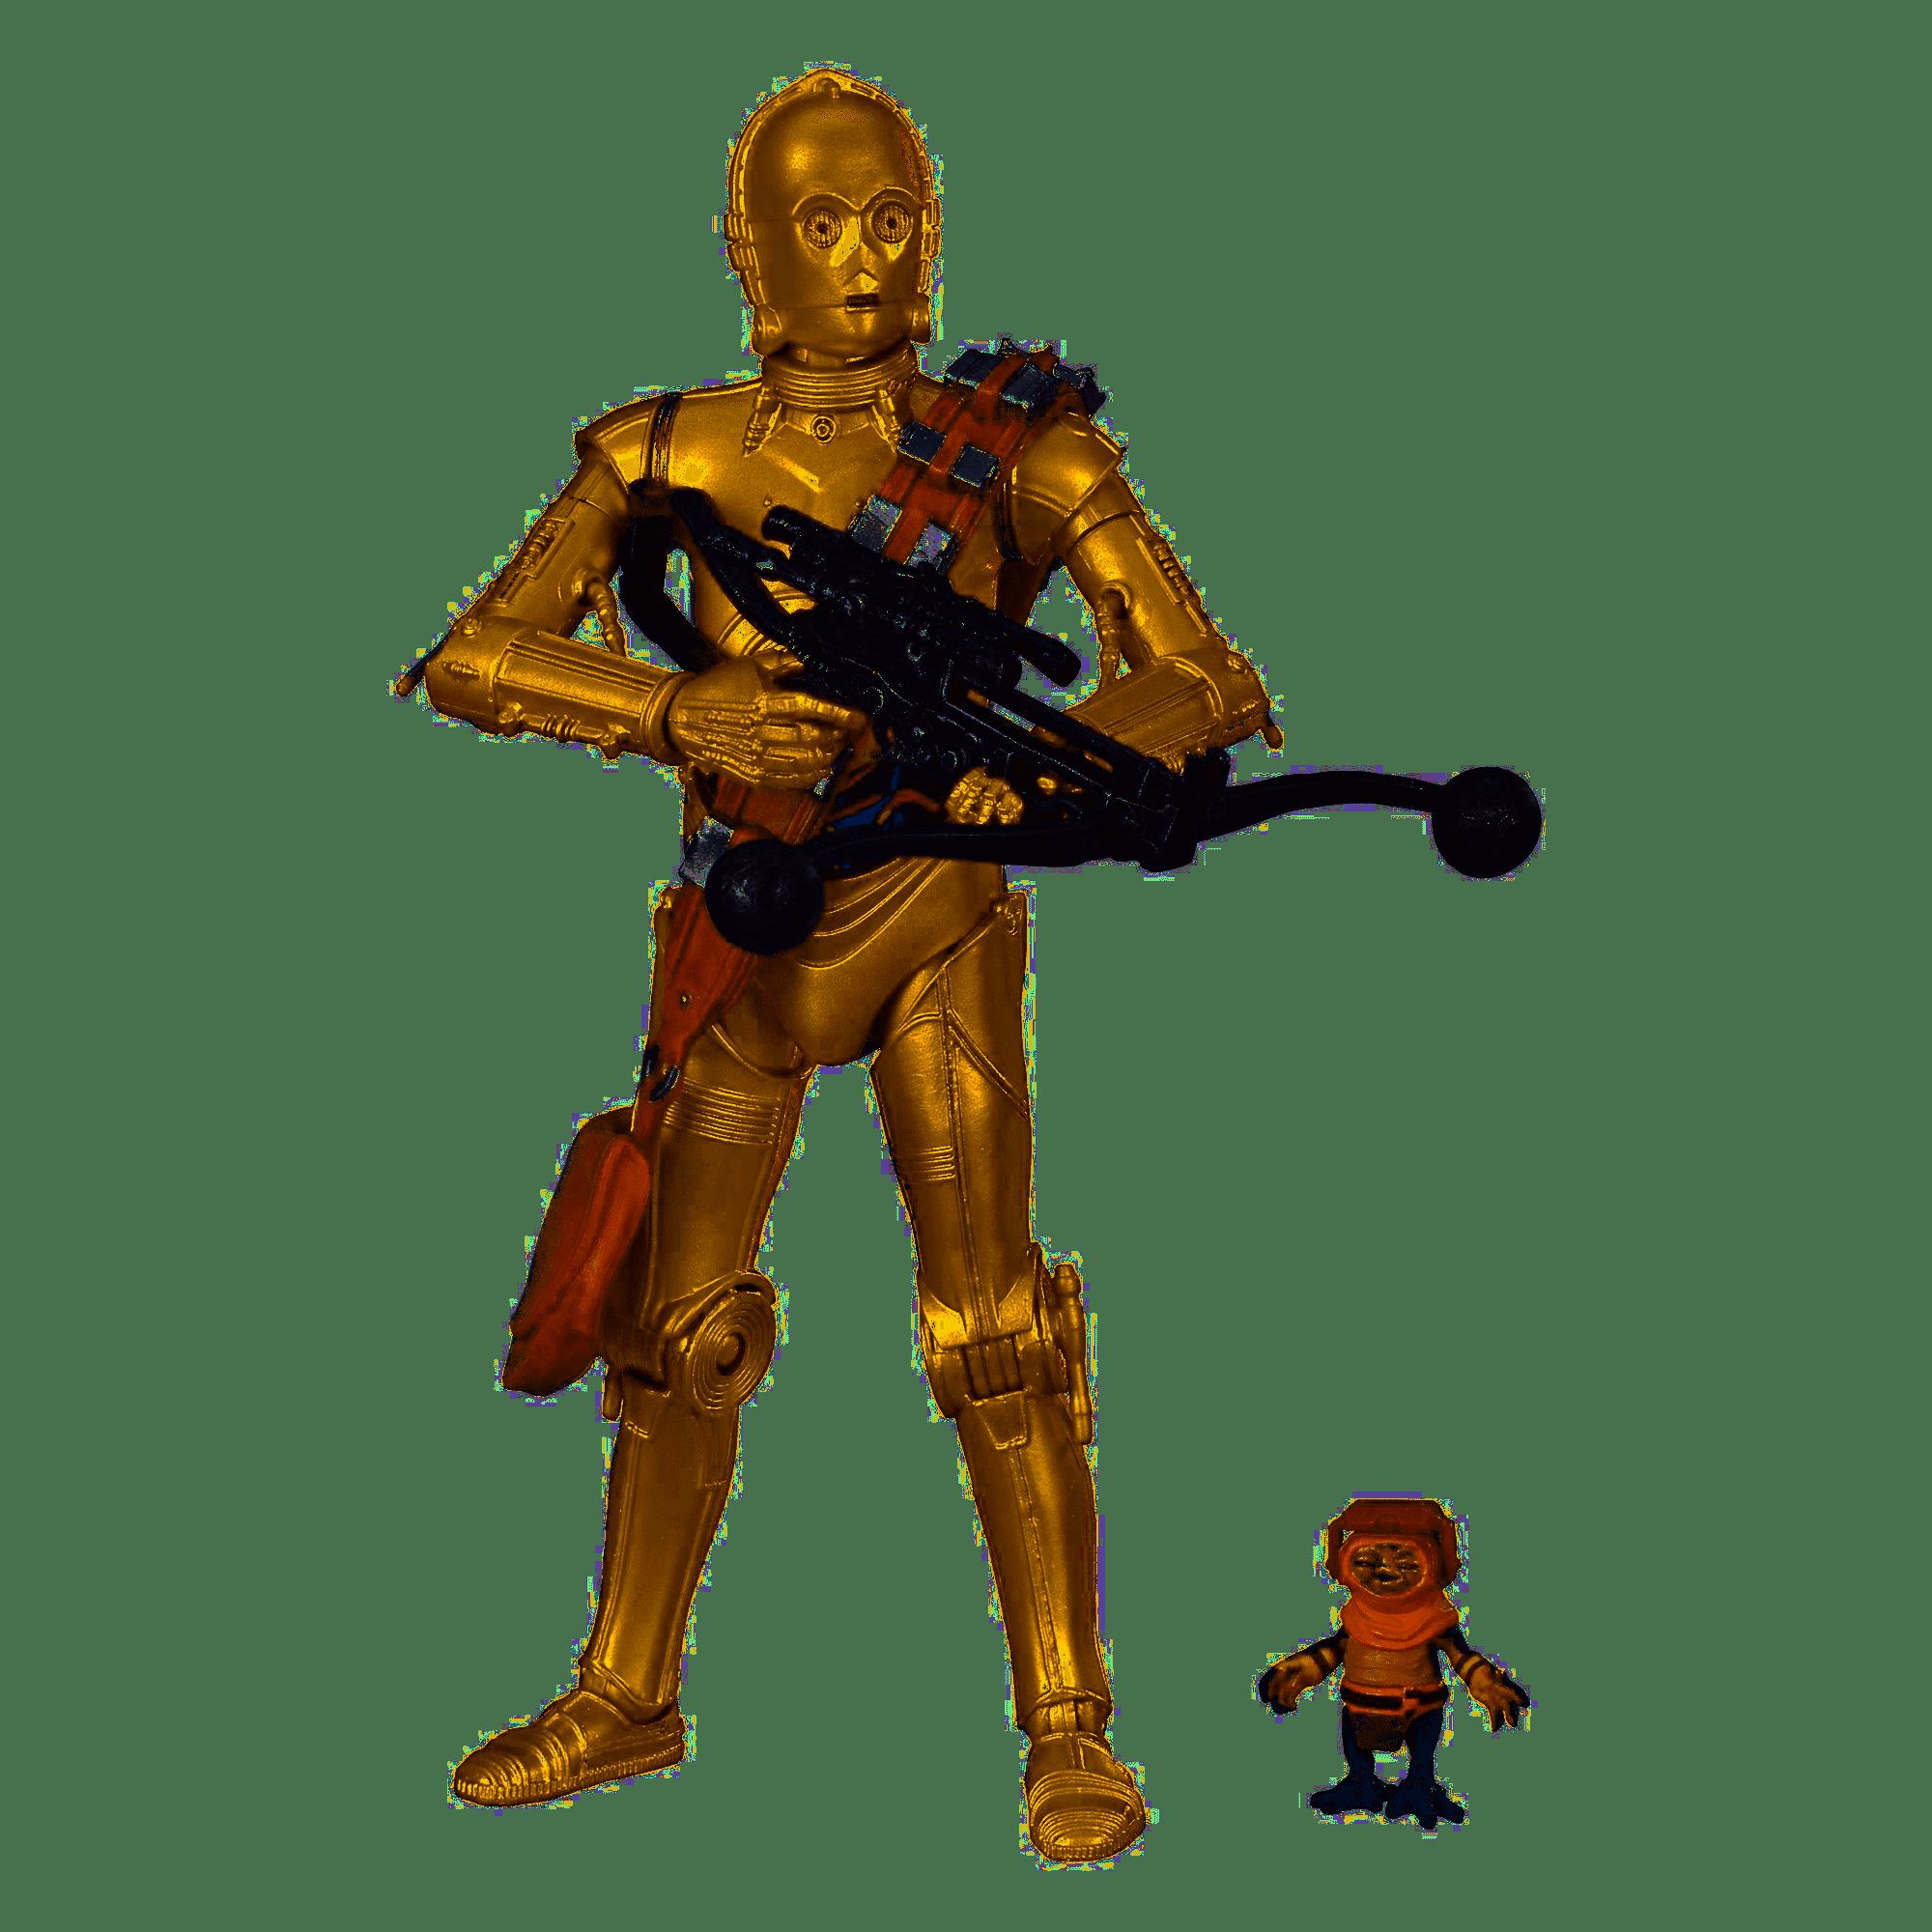 TROS C-3PO & Babu Frik BS Figure Set 2